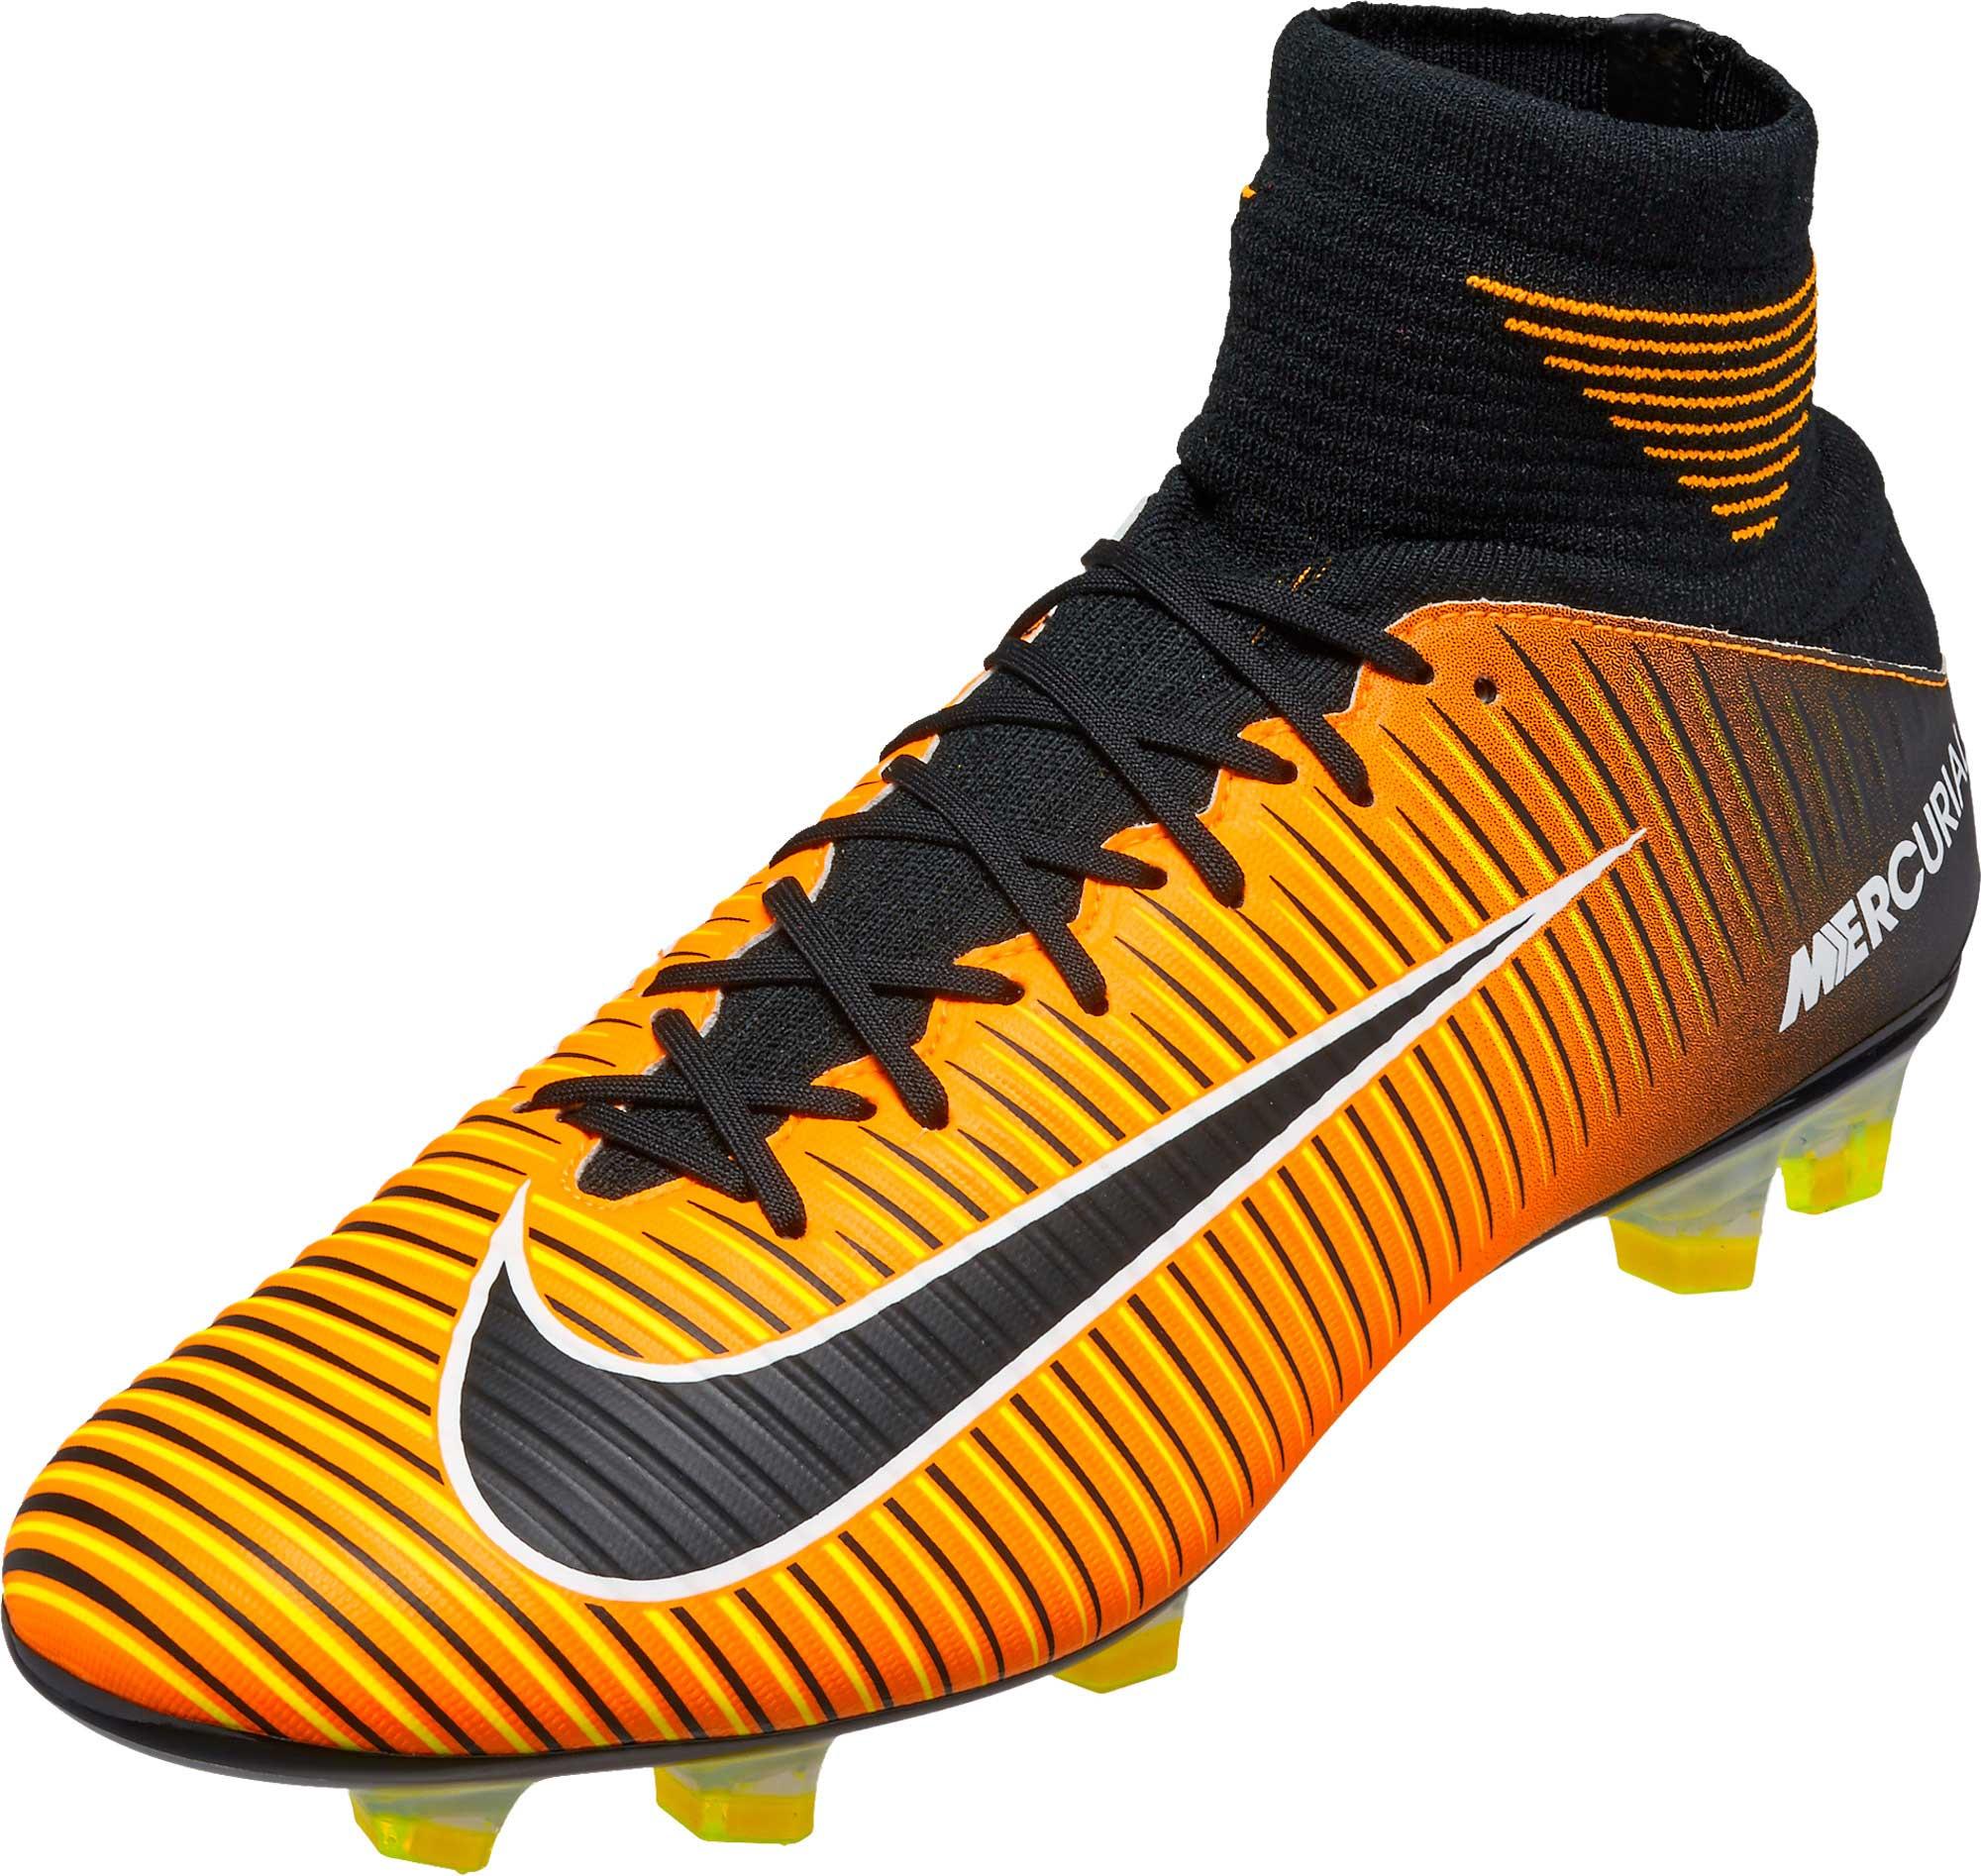 low priced 9695c 140cb Nike Mercurial Veloce III DF FG Soccer Cleats – Laser Orange  Black